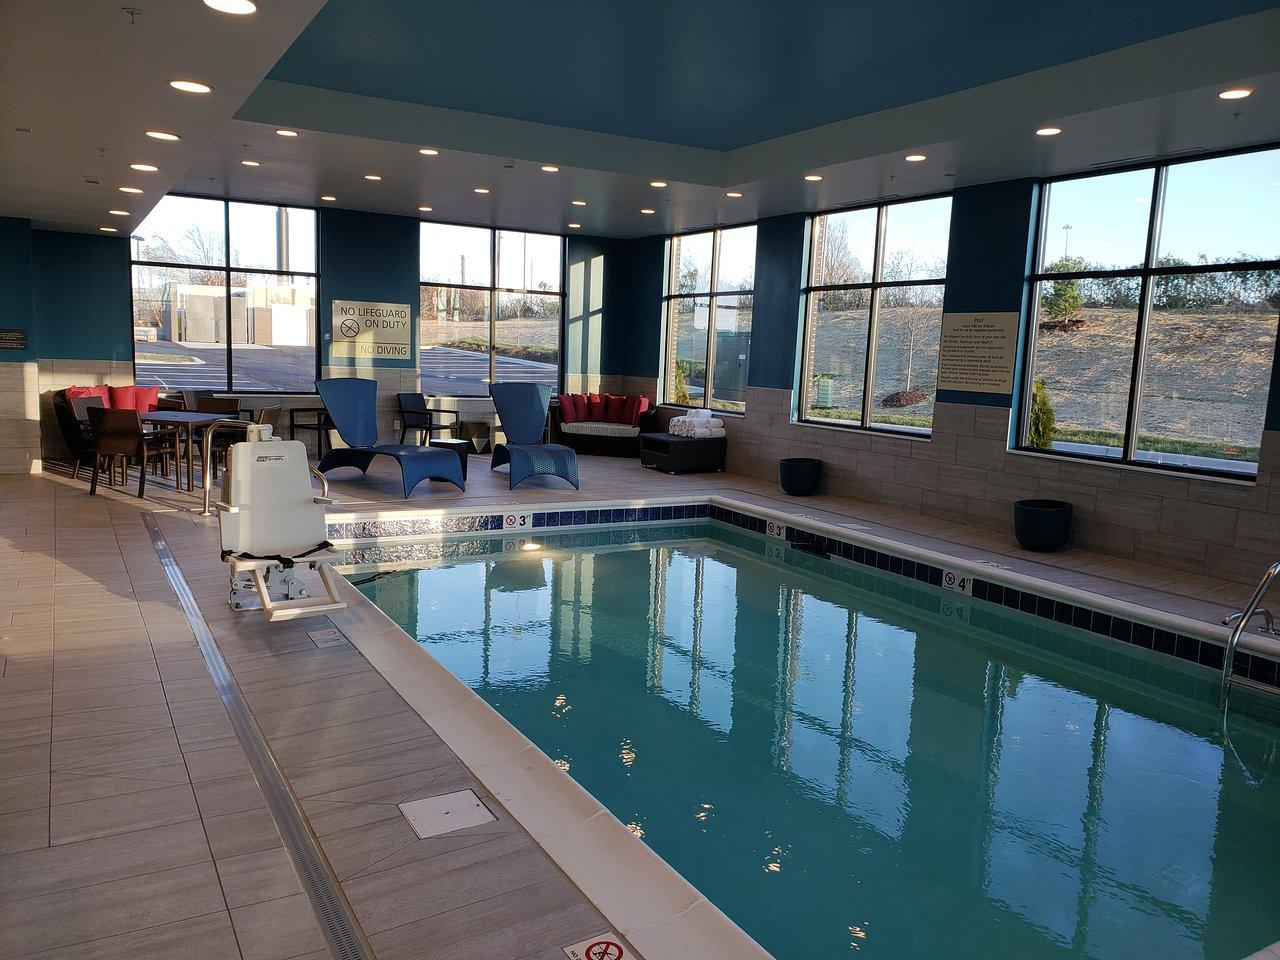 Hampton Inn Simpsonville Updated 2018 Prices Hotel Reviews Ky Tripadvisor